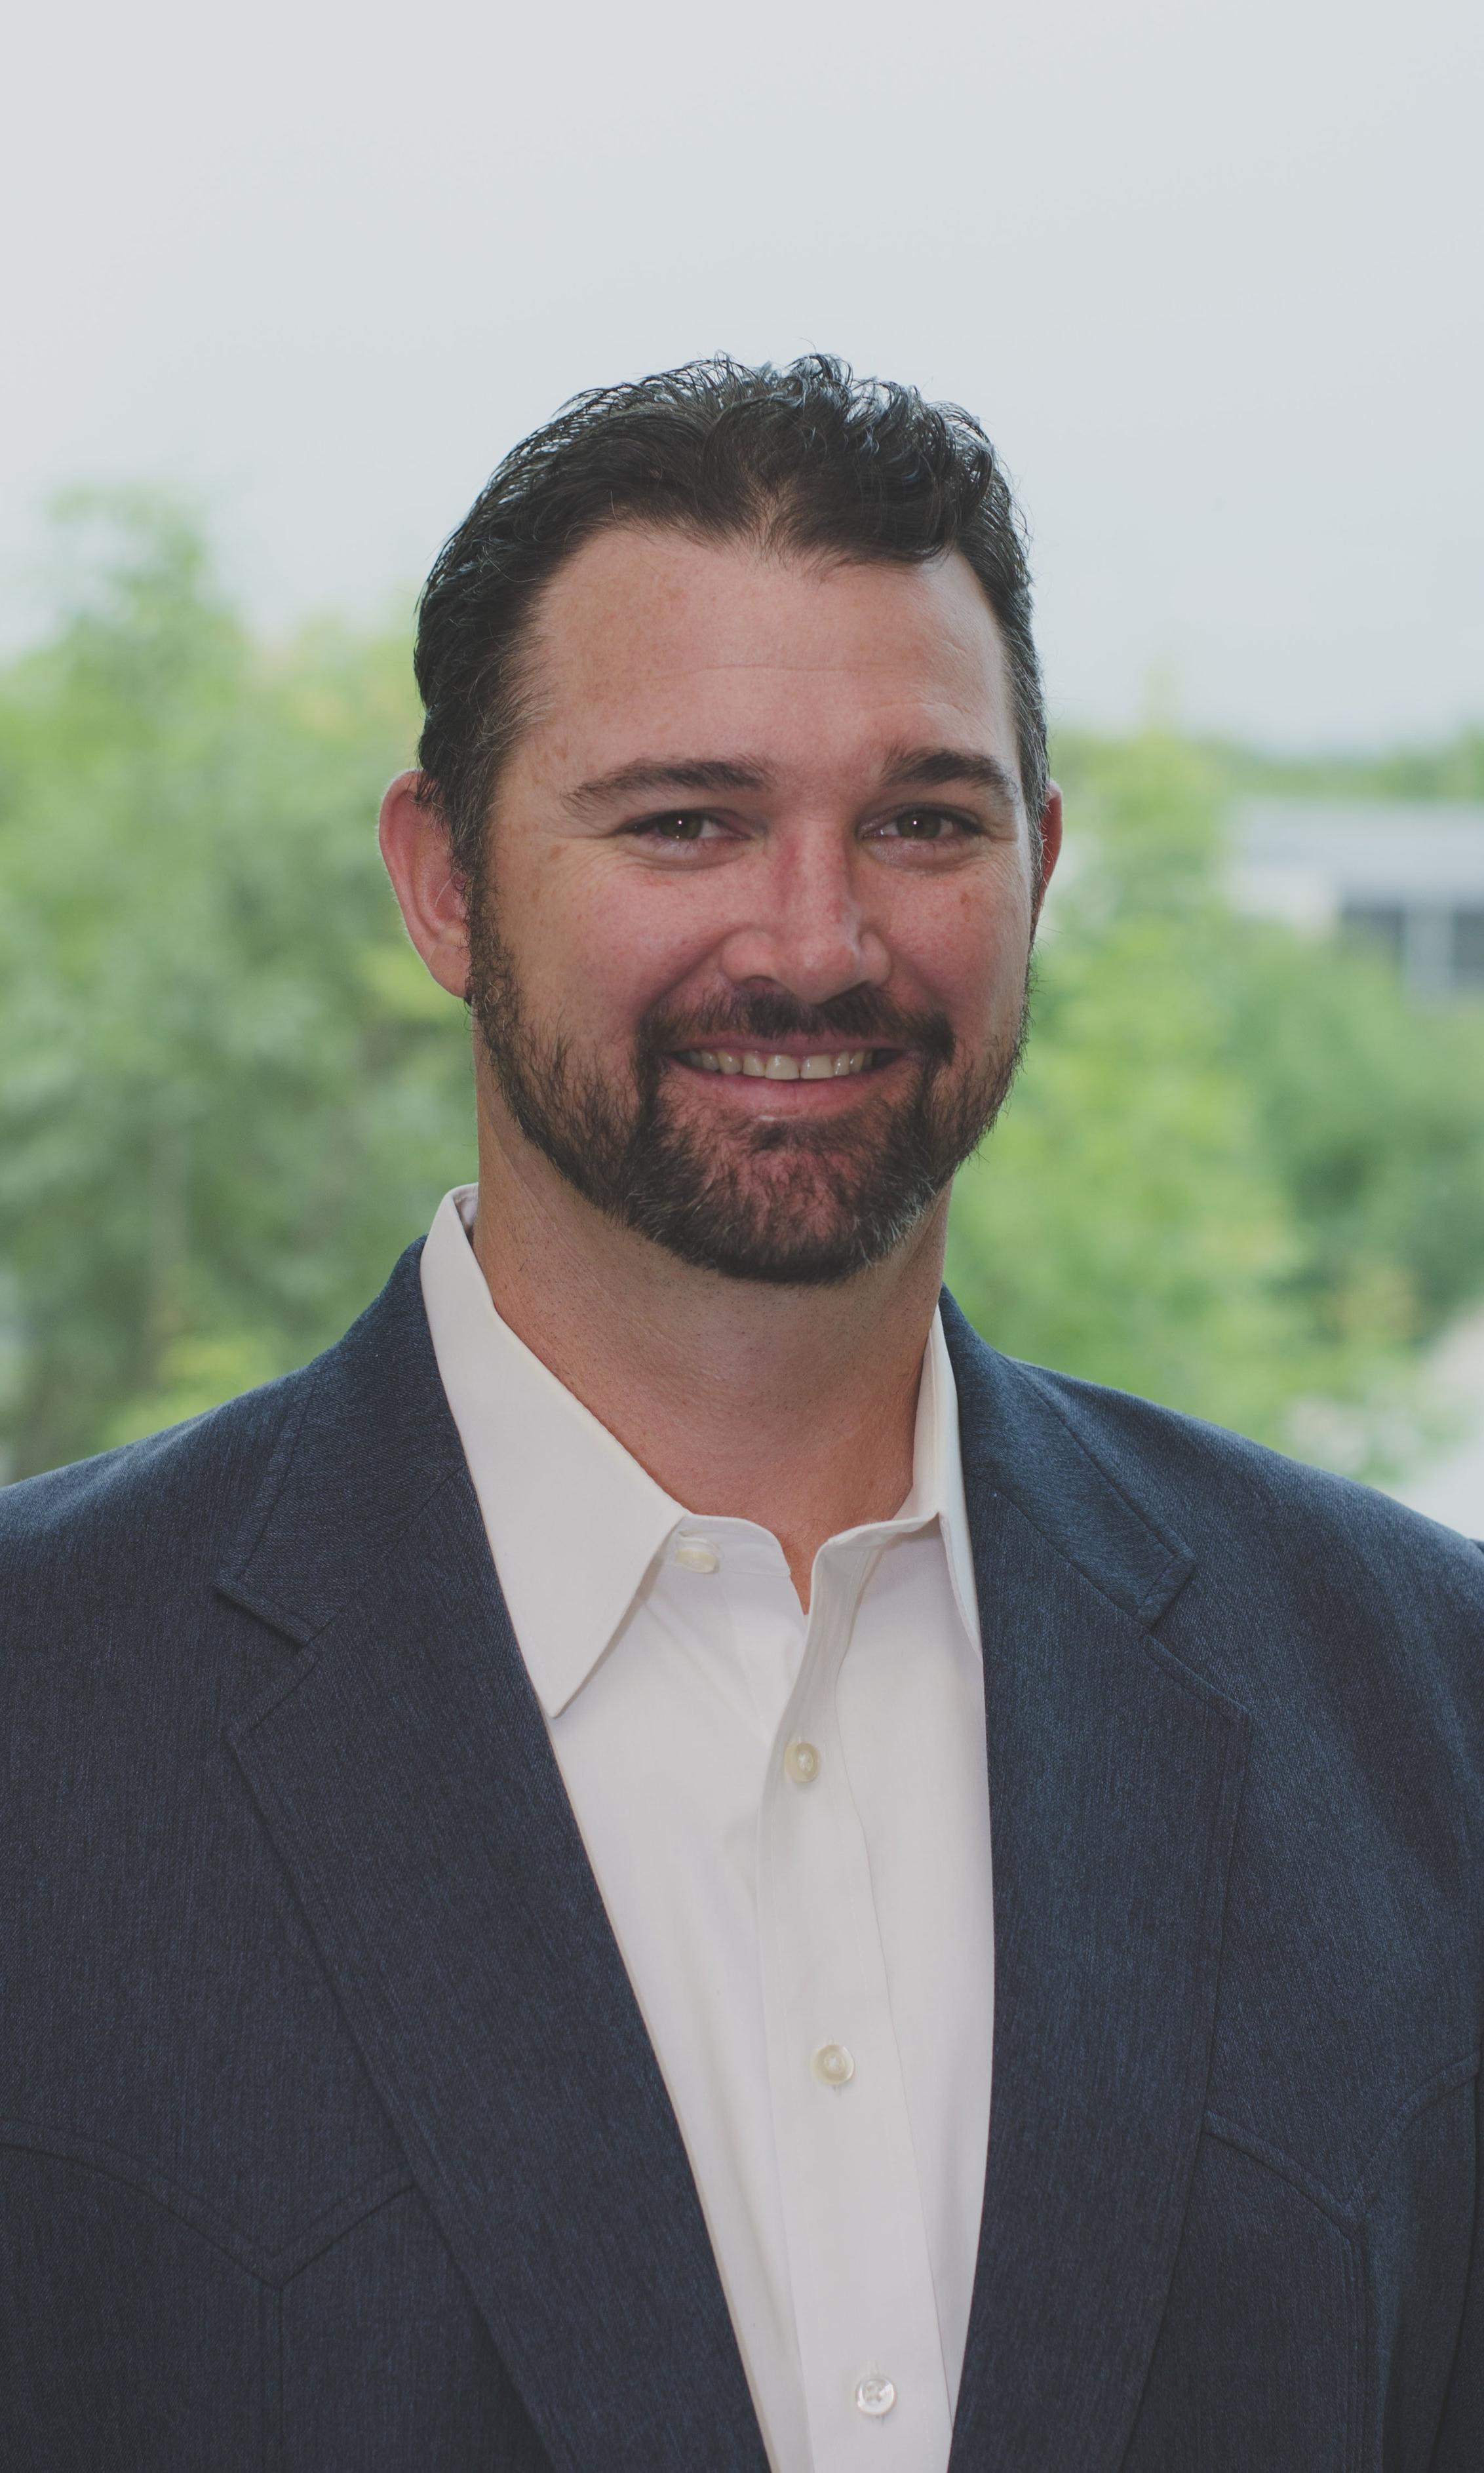 rob schneider - vice president of houston division